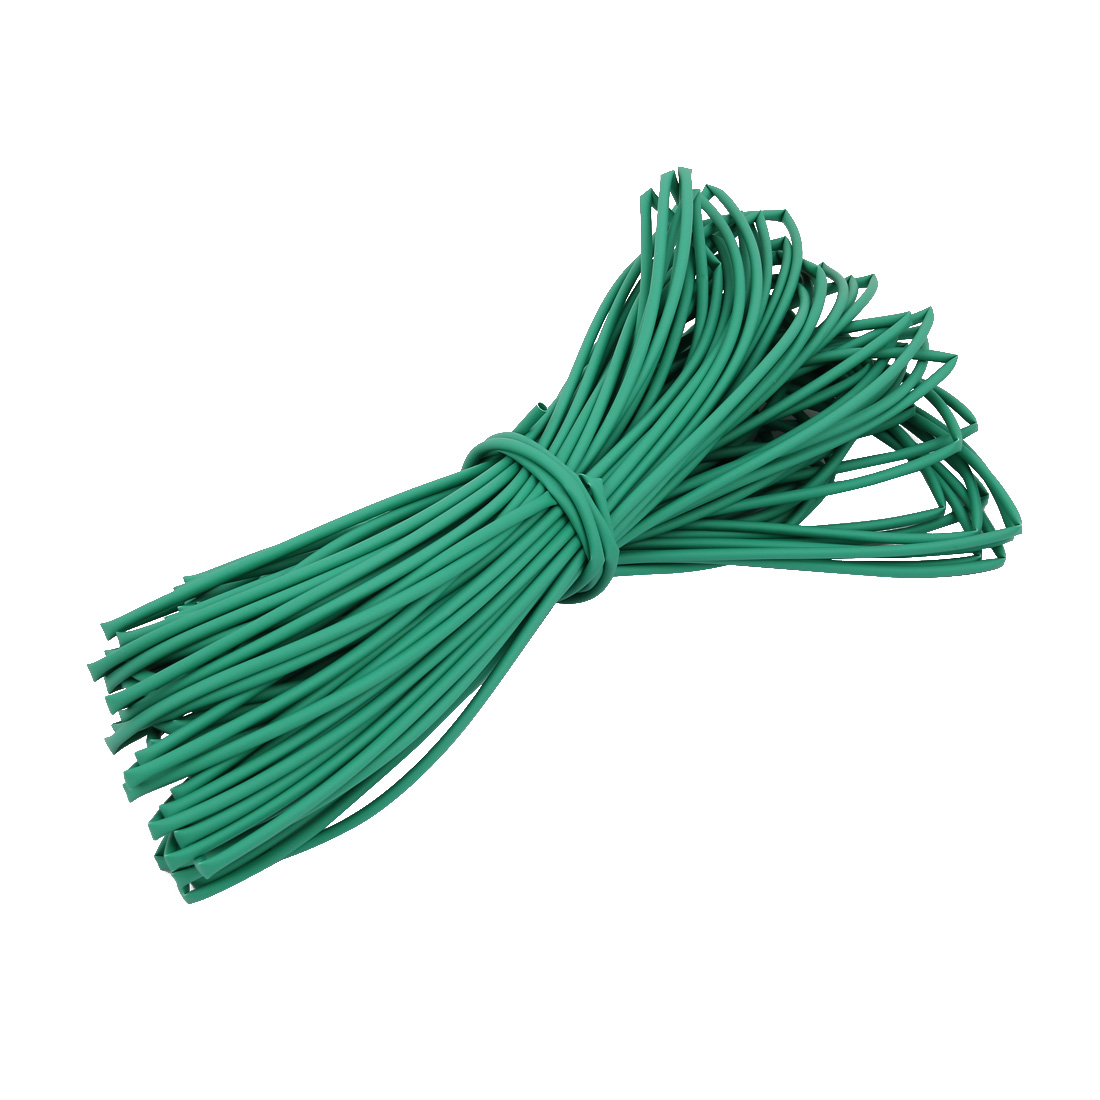 30M 0.08in Inner Dia Polyolefin Flame Retardant Tube Green for Wire Repairing